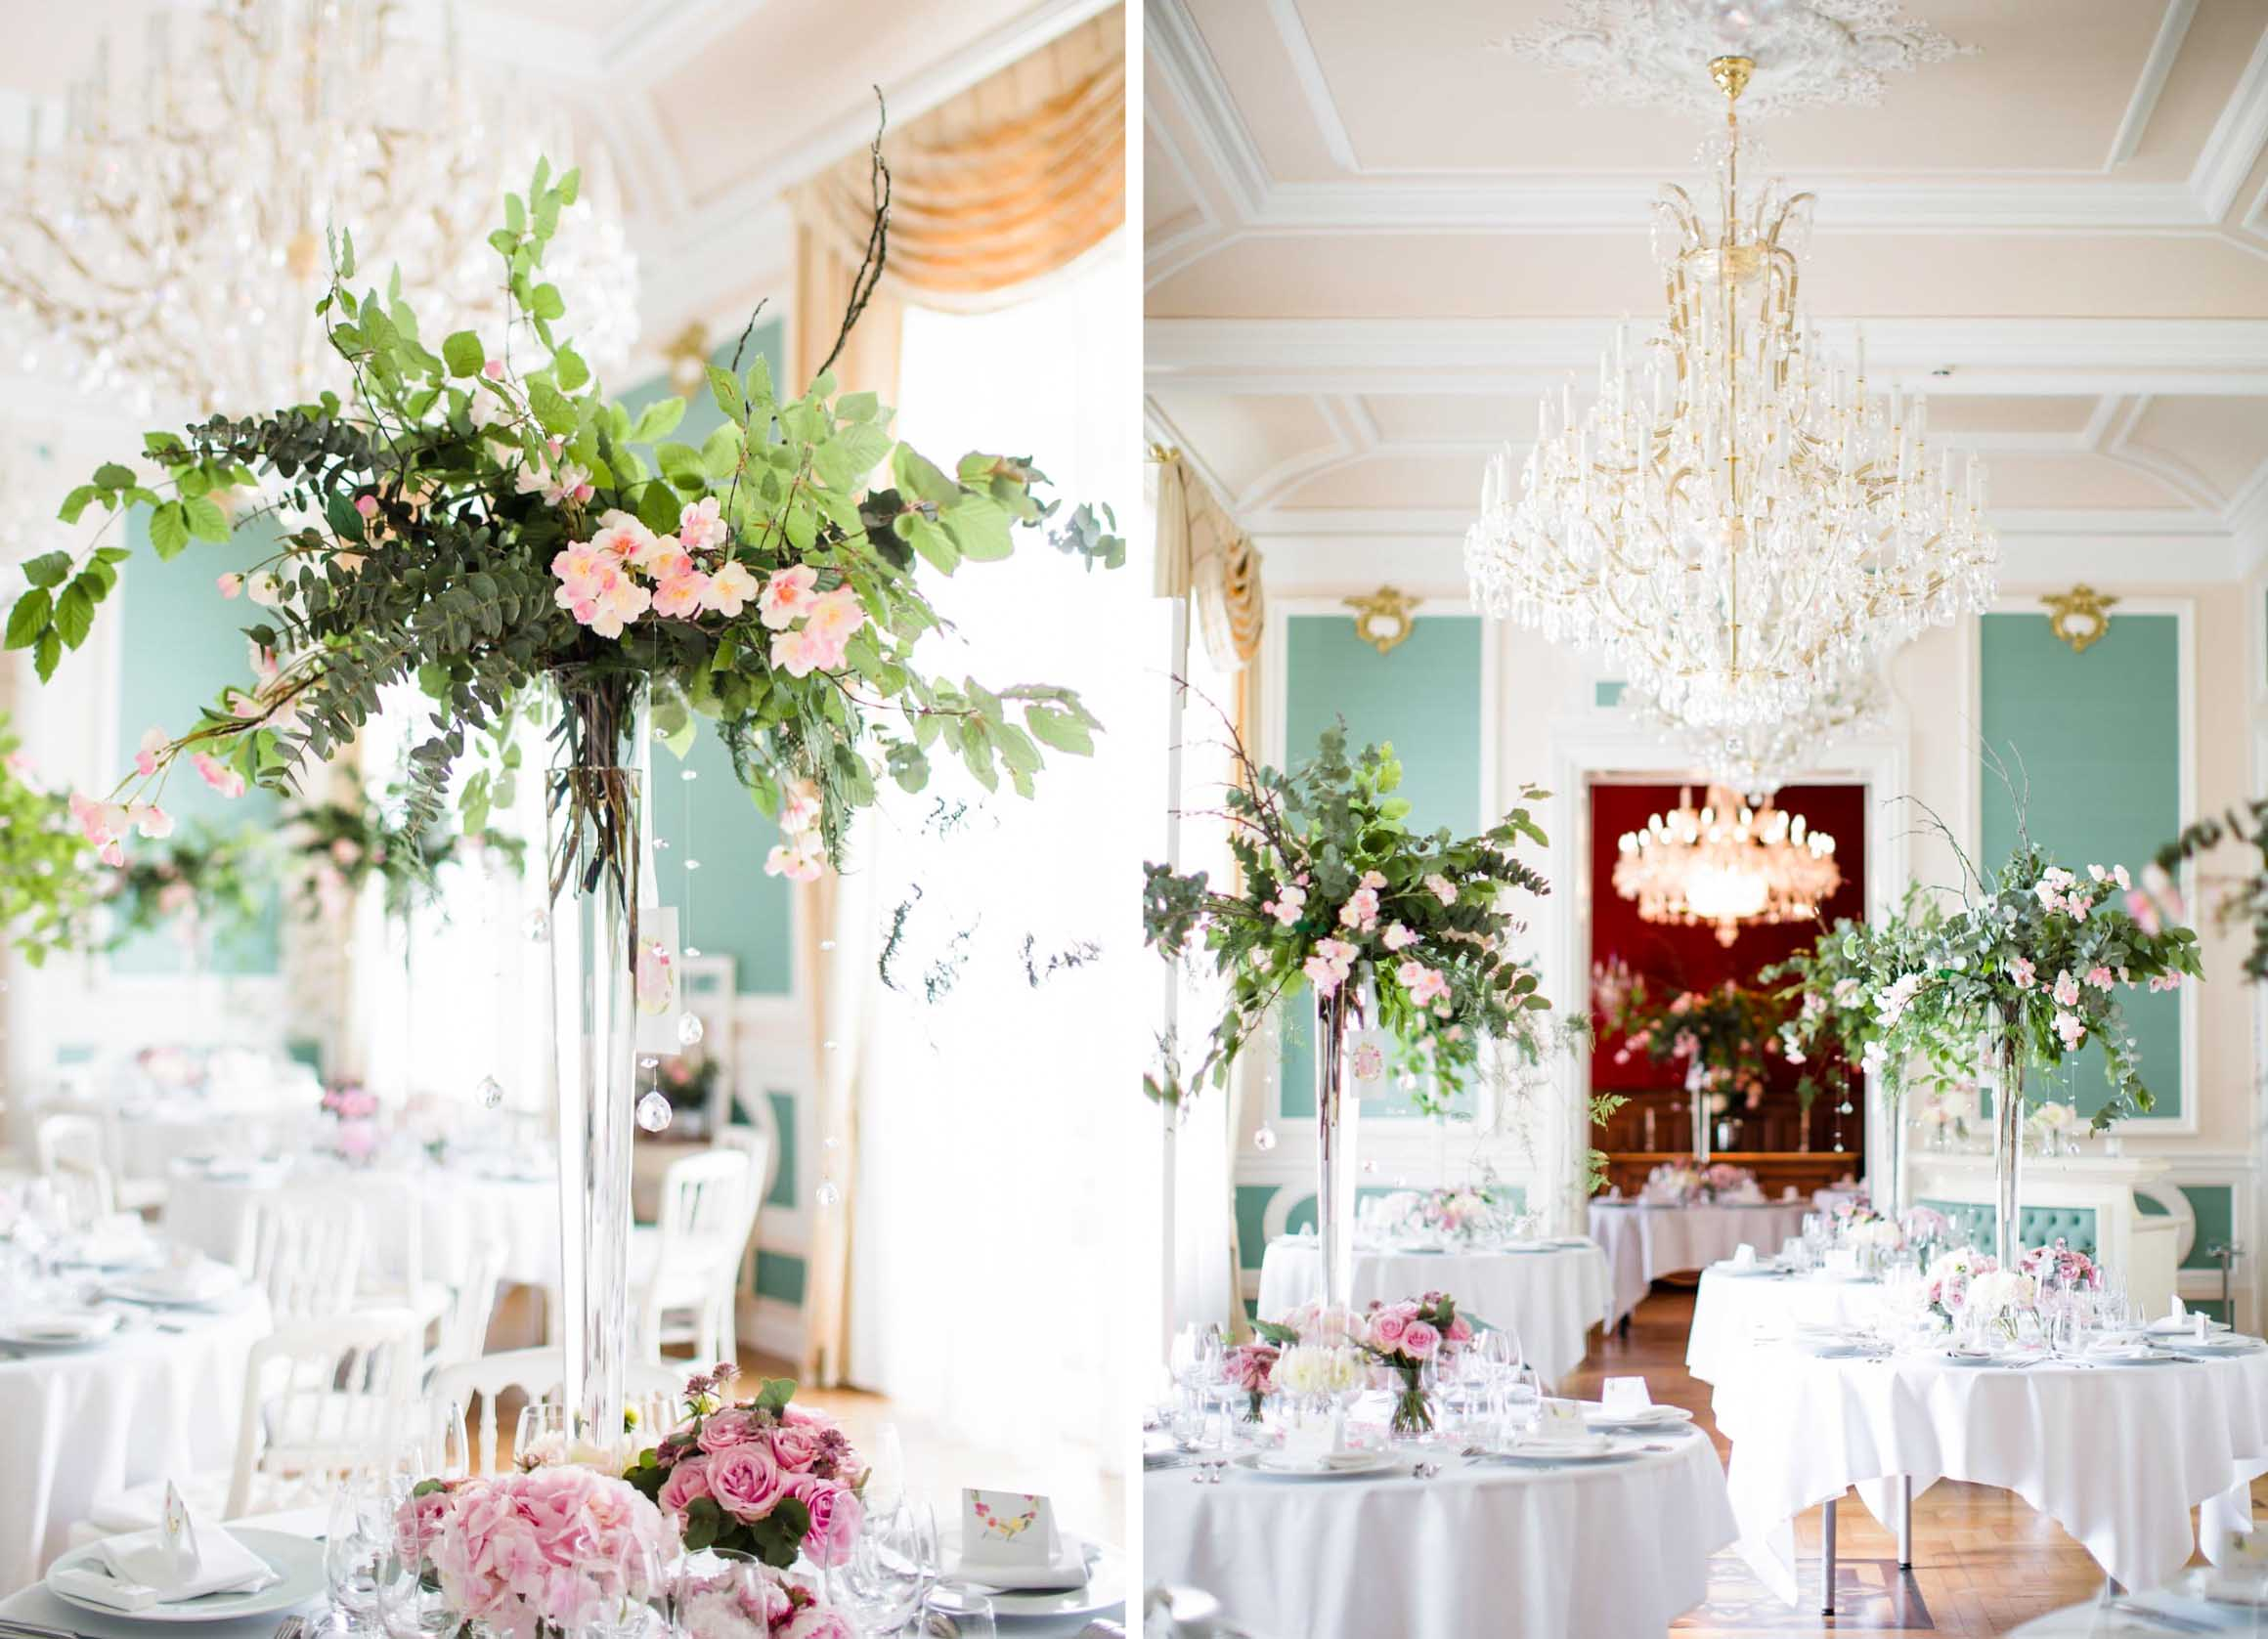 Amy O'Boyle Photography- Chateau Bouffemont Wedding- France Wedding Photographer 7.jpg